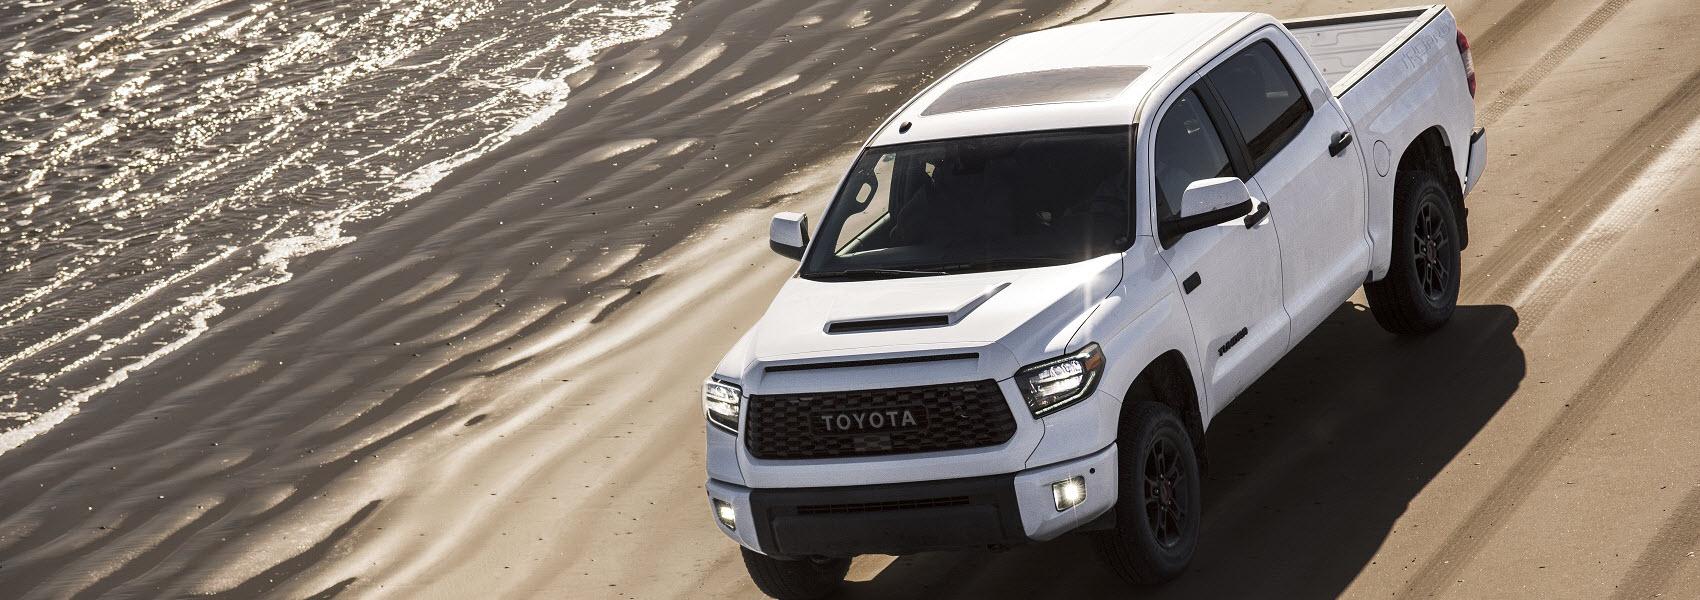 Toyota Tundra Trim Levels Statesboro GA